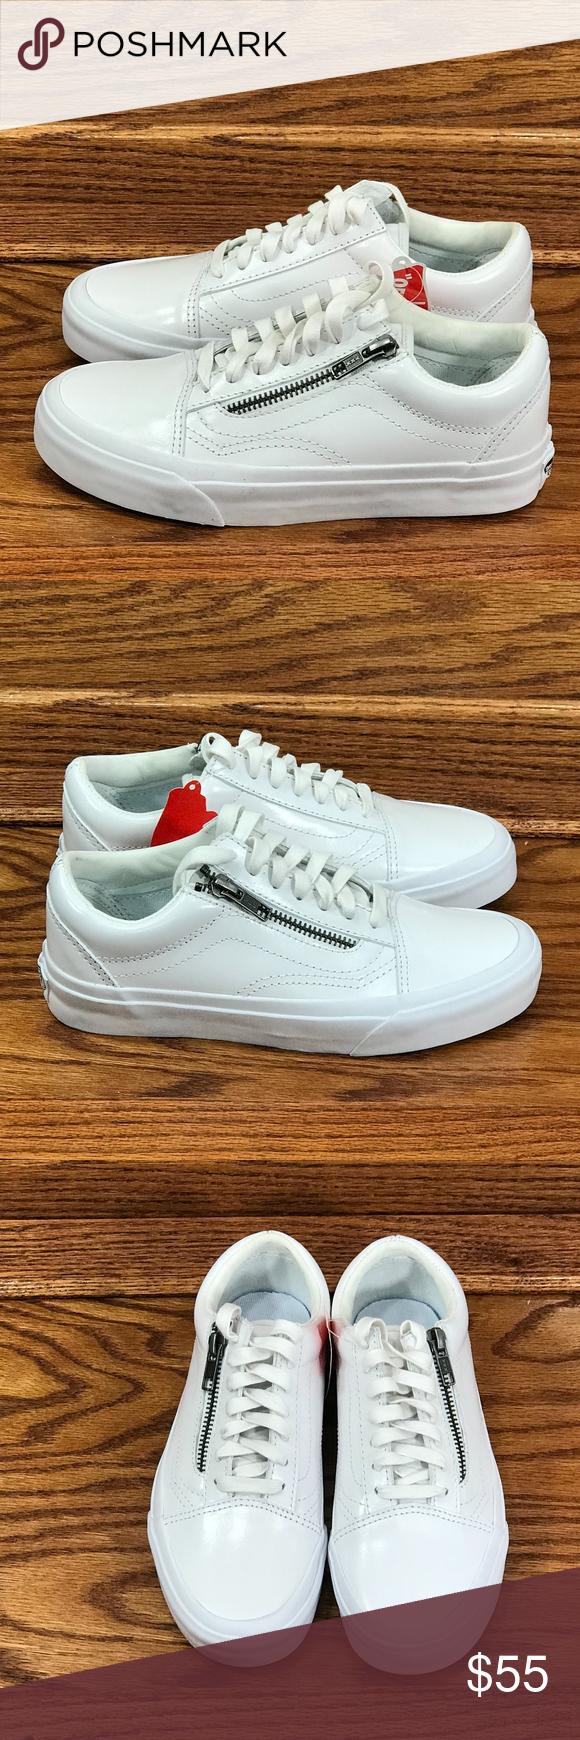 1636785baef4d Vans Old Skool ZIp DX Smooth Leather True White Vans Old Skool ZIp DX  Smooth Leather True White Shoes Size Men 3.5 Women 5 Brand new in box  Unisex Vans ...